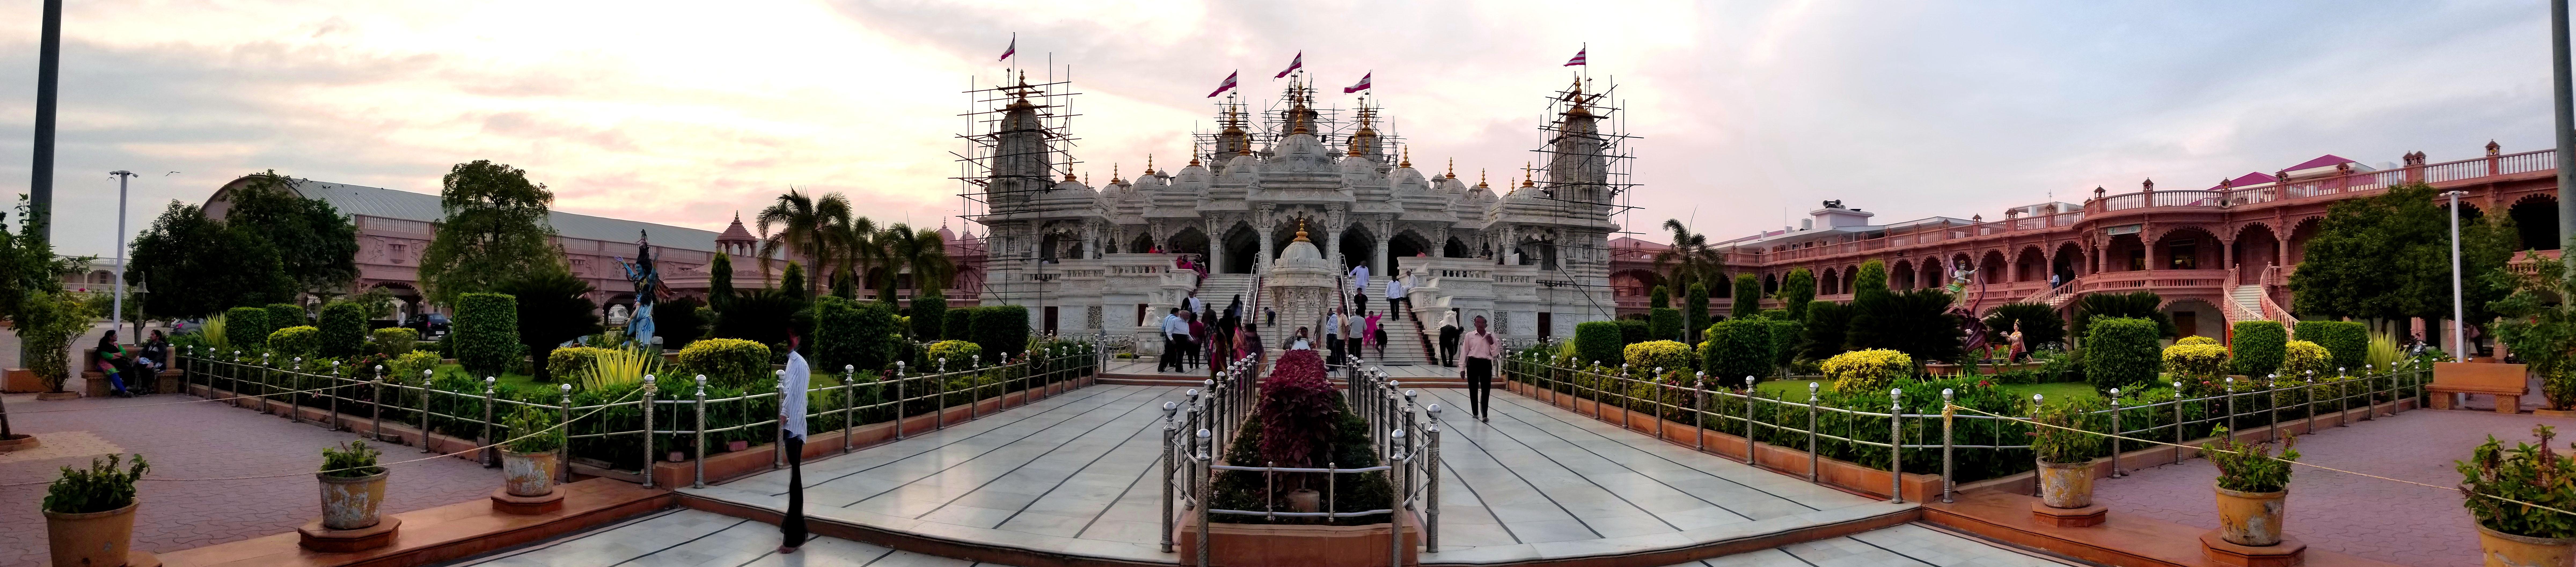 SN temple panorama